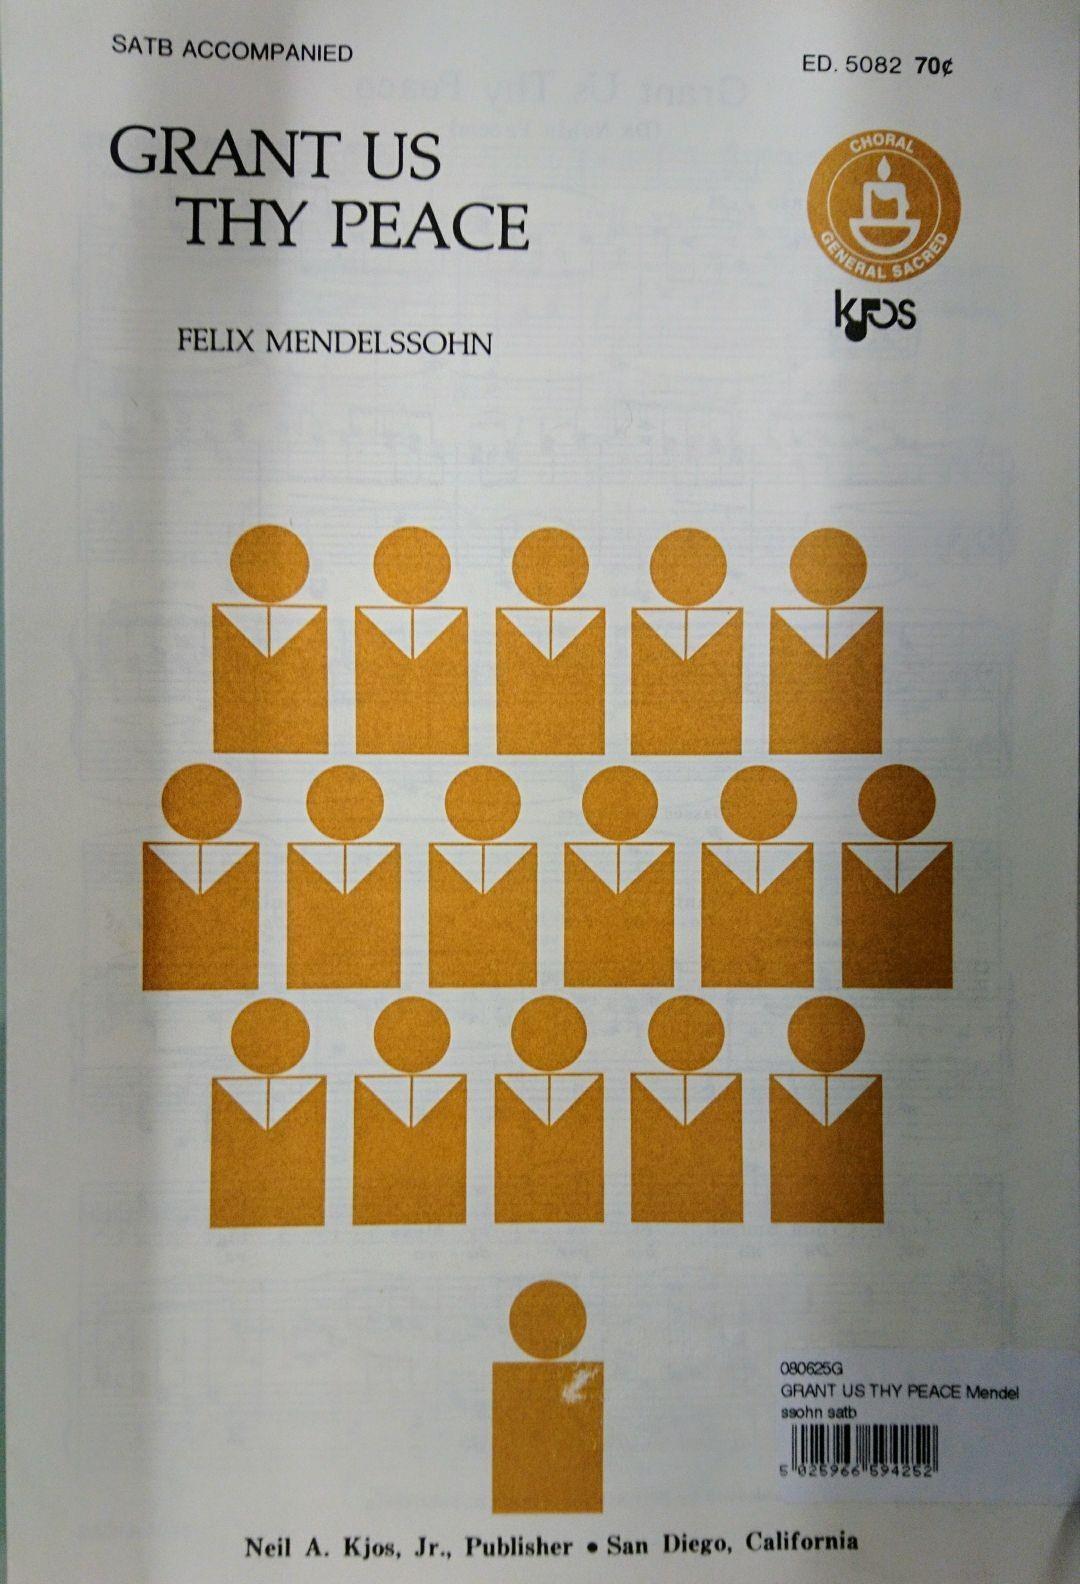 Grant Us Thy Peace Mendelssohn Sheet Music SATB Accompanied S162